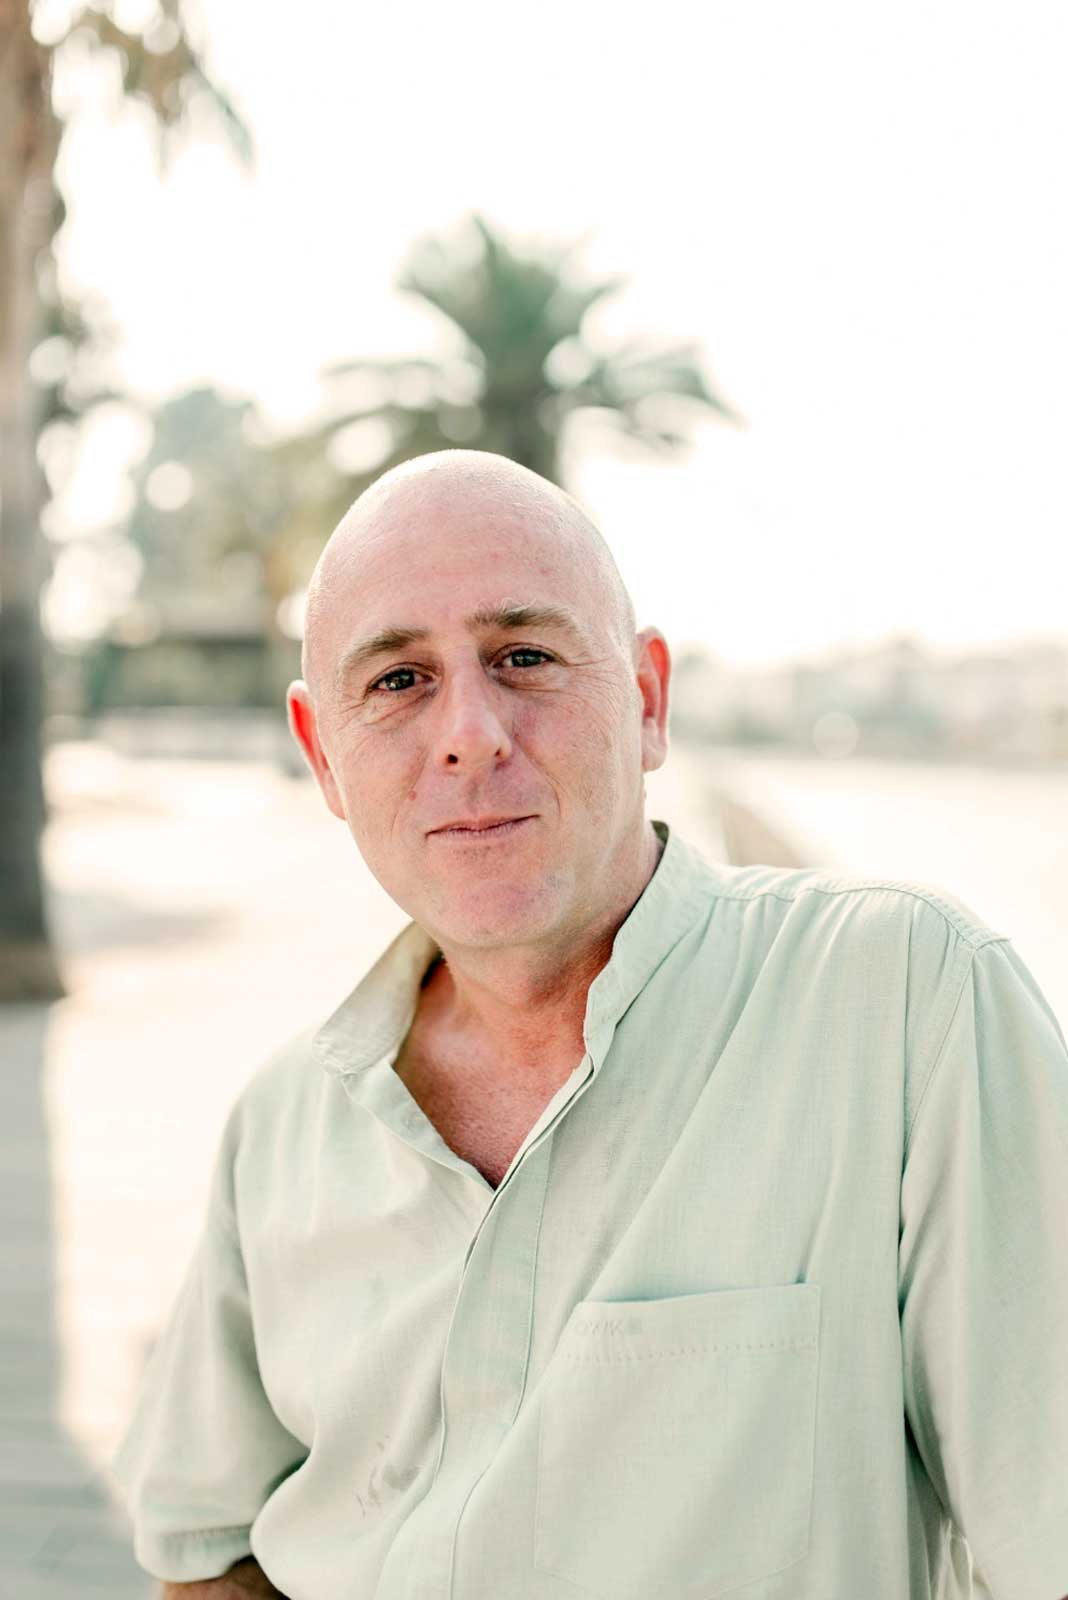 Fernando Baquero